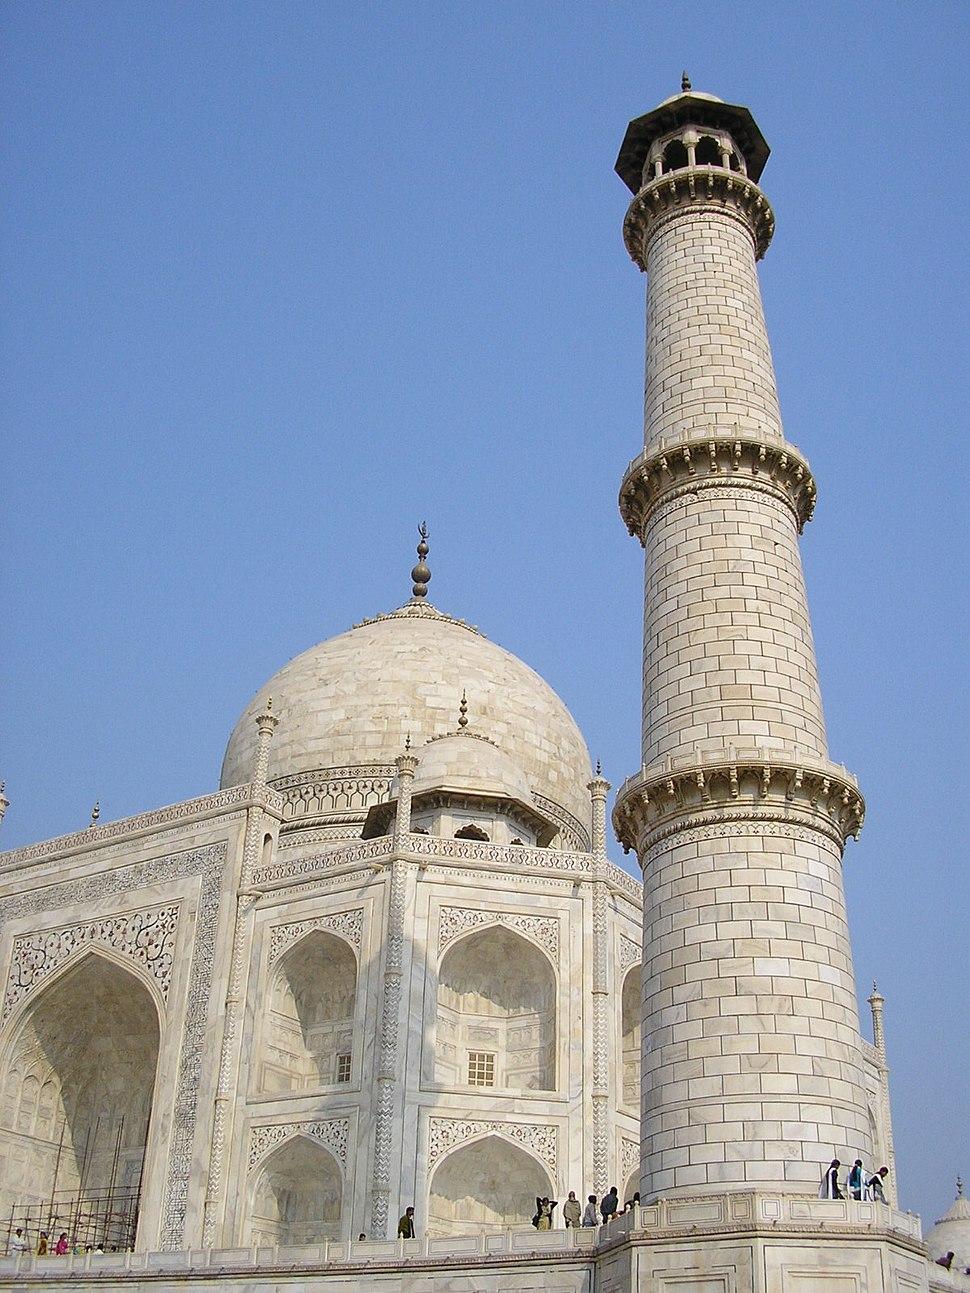 Base, dome and minaret.